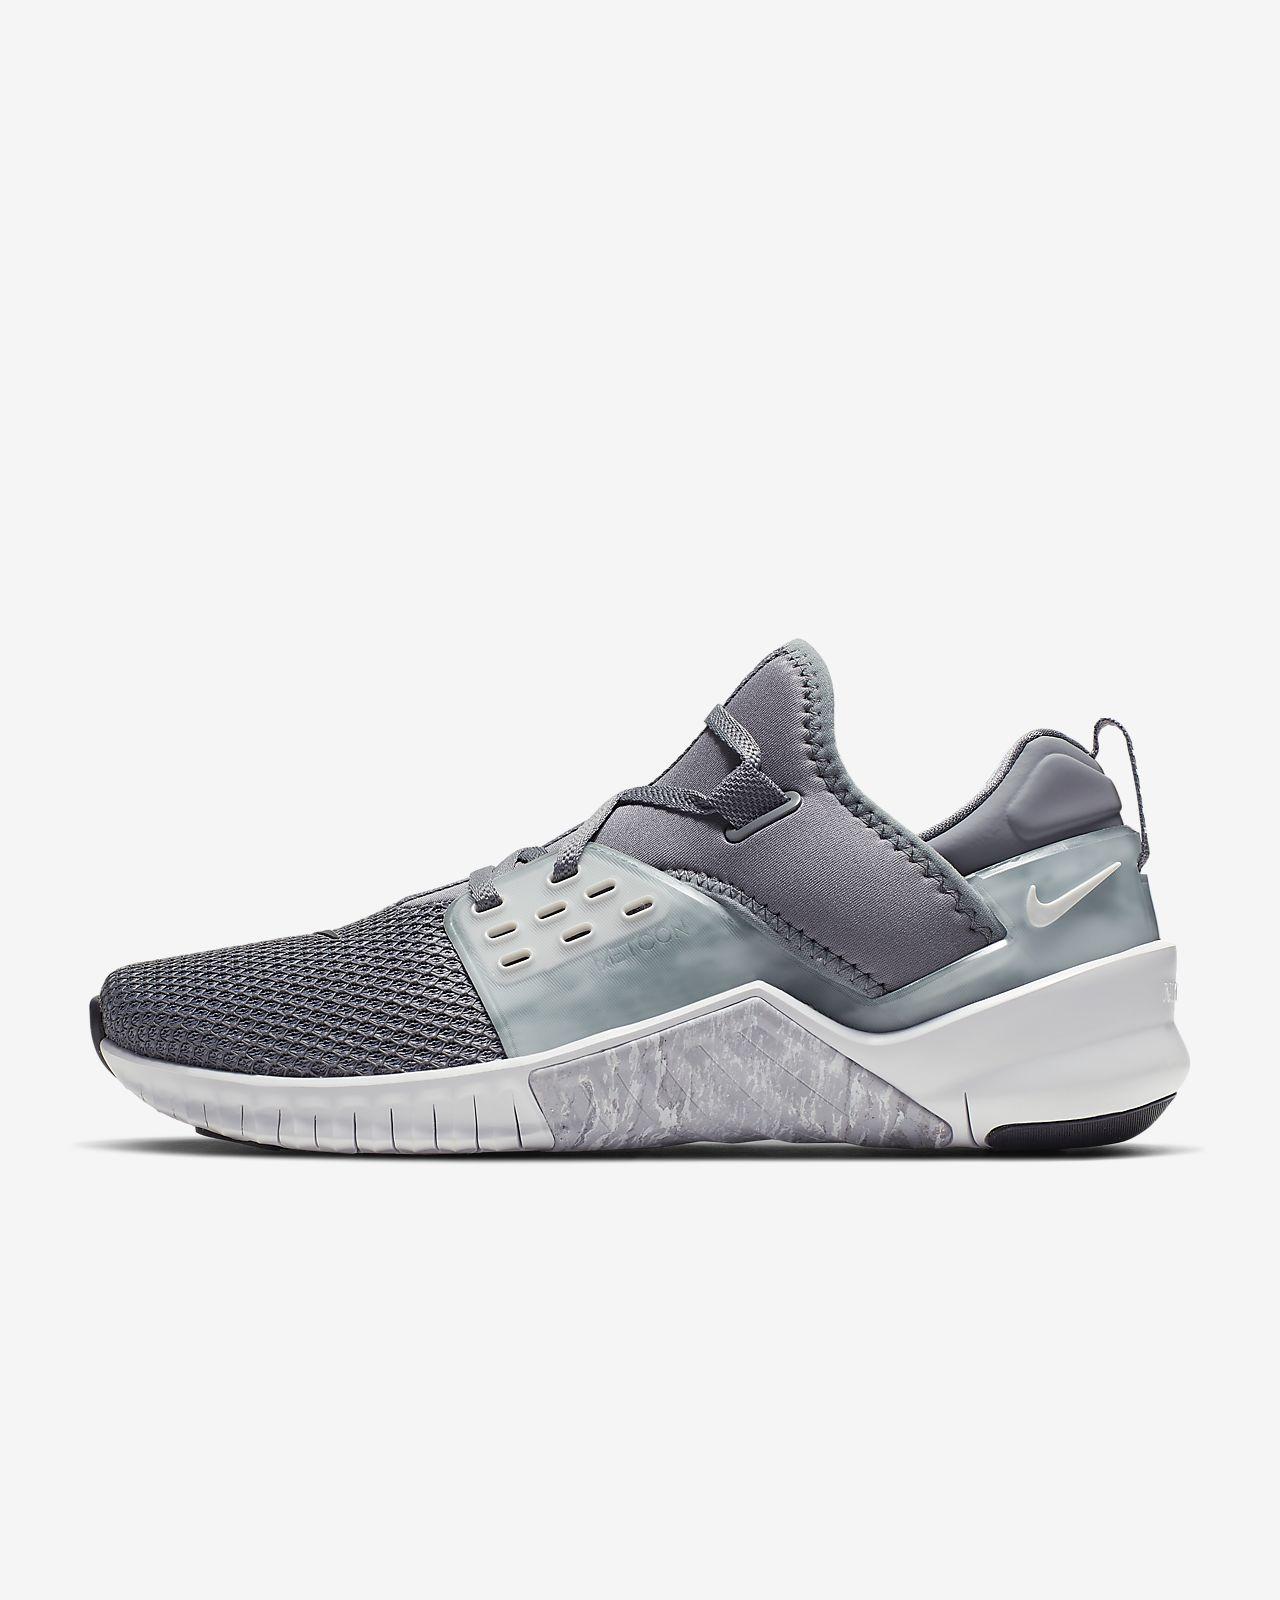 promo code c8bd6 1bec4 ... Chaussure de training Nike Free X Metcon 2 pour Homme